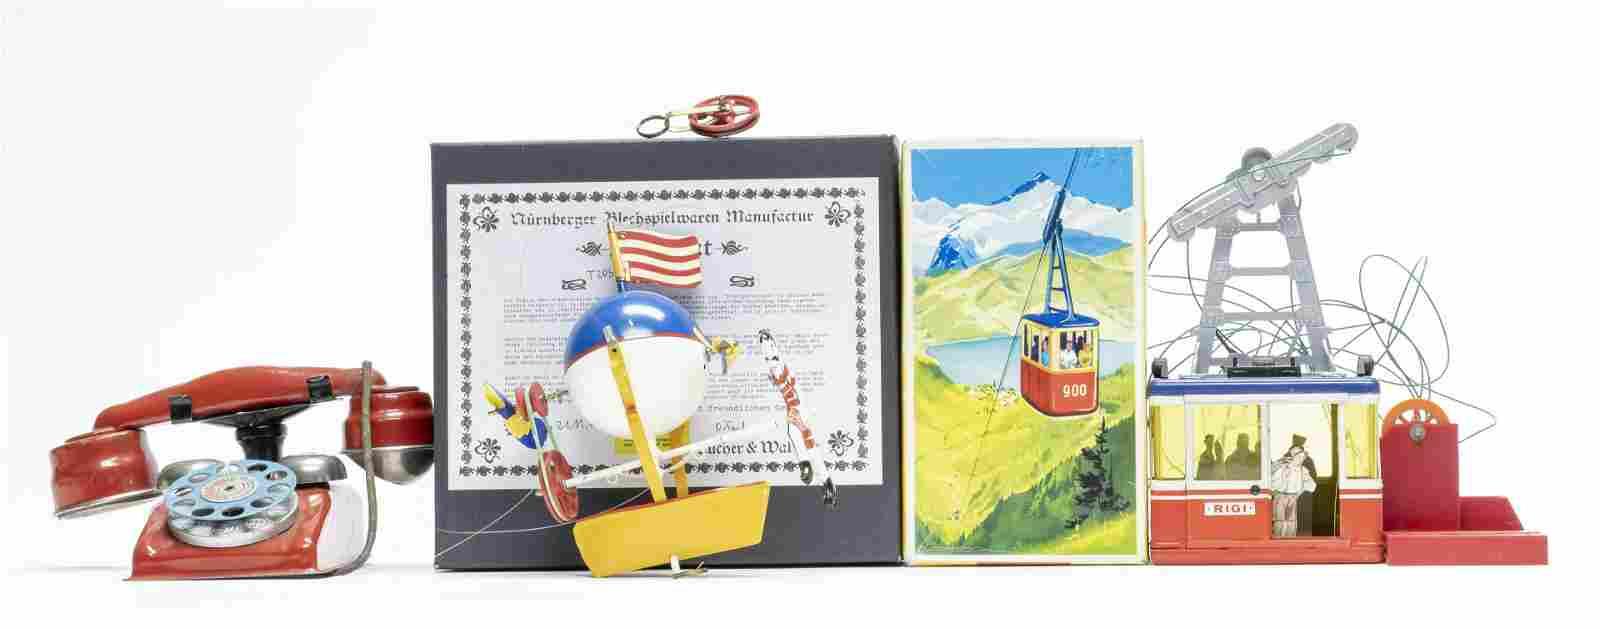 Three Fun Toys Gong Bell